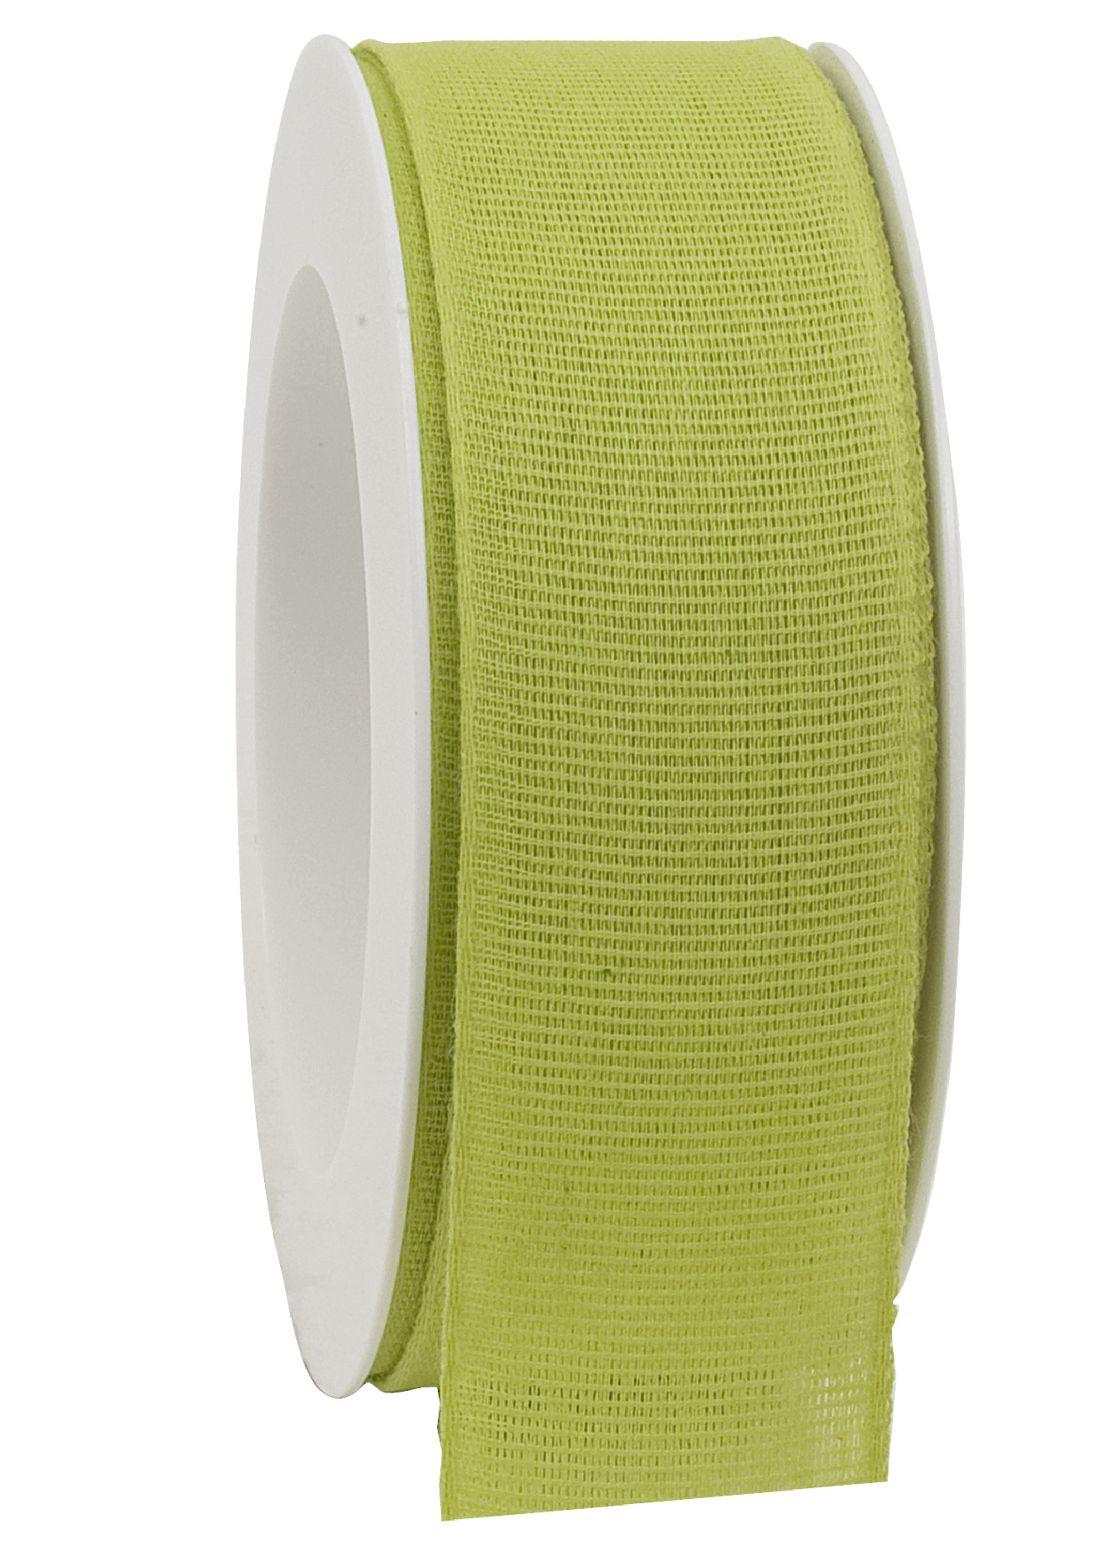 Basicband NATURE grün 53 biologisch abbaubar B:40mm L:20m Baumwollband 267